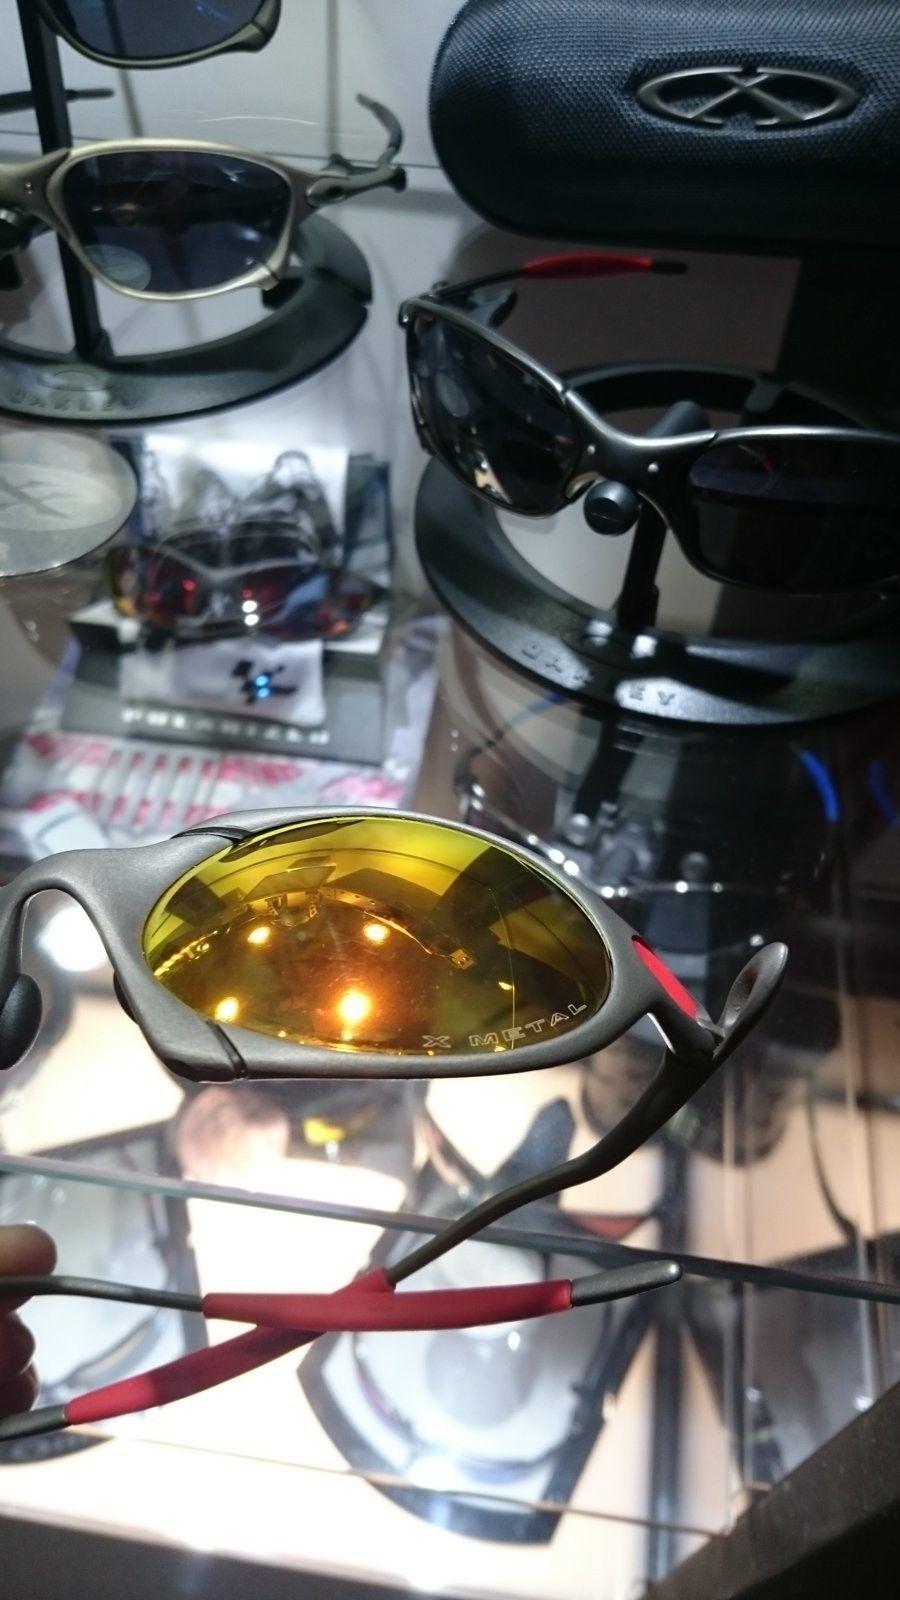 X-metal R1 with 2 sets of OEM lenses - DSC_0053.JPG